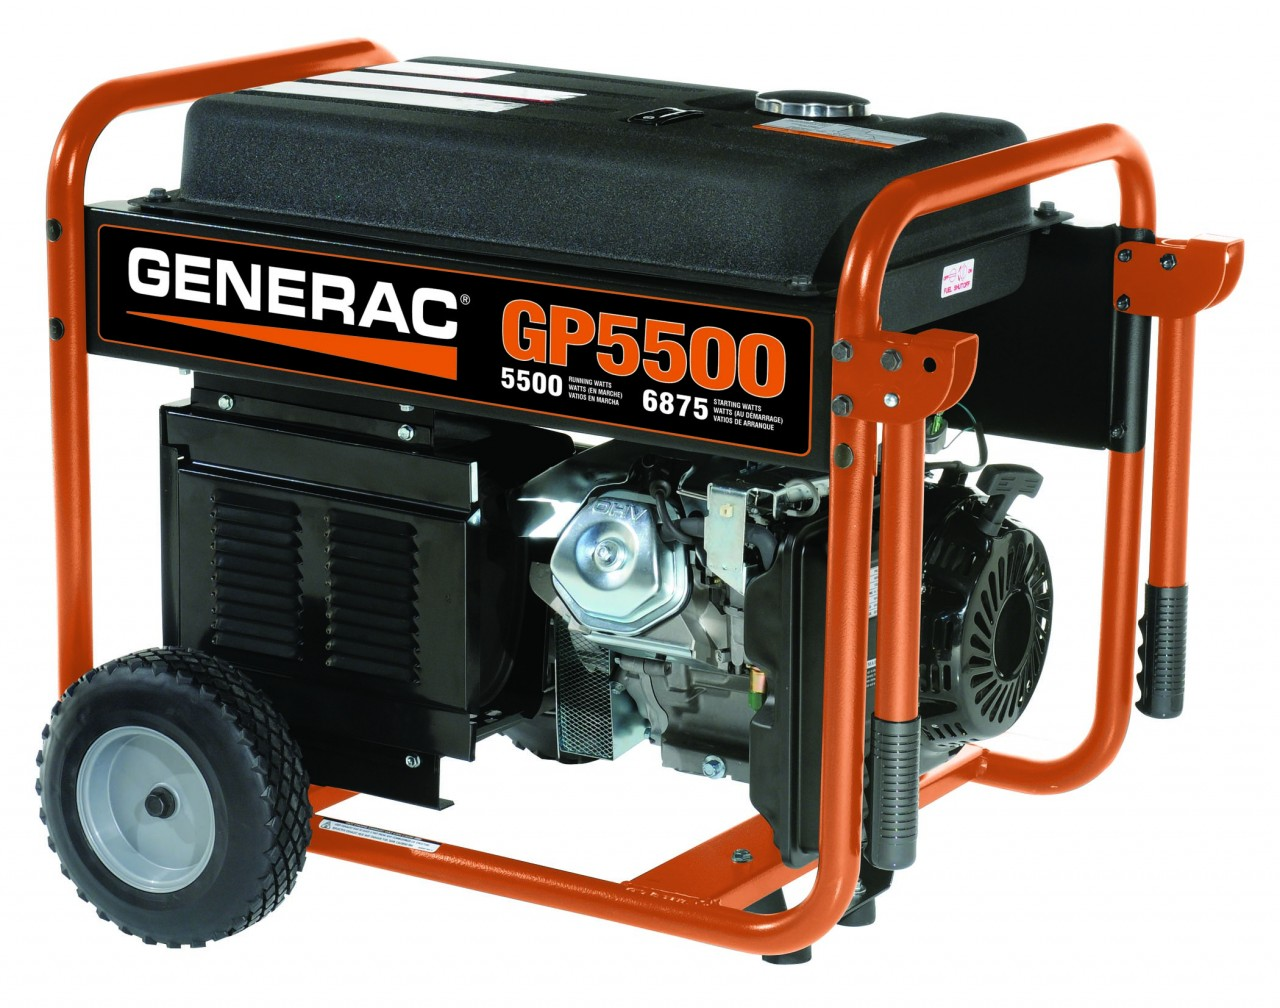 hight resolution of generac 5500 watt generator wiring diagram generator transfer switch diagram wiring diagram centurion 3250 watt portable